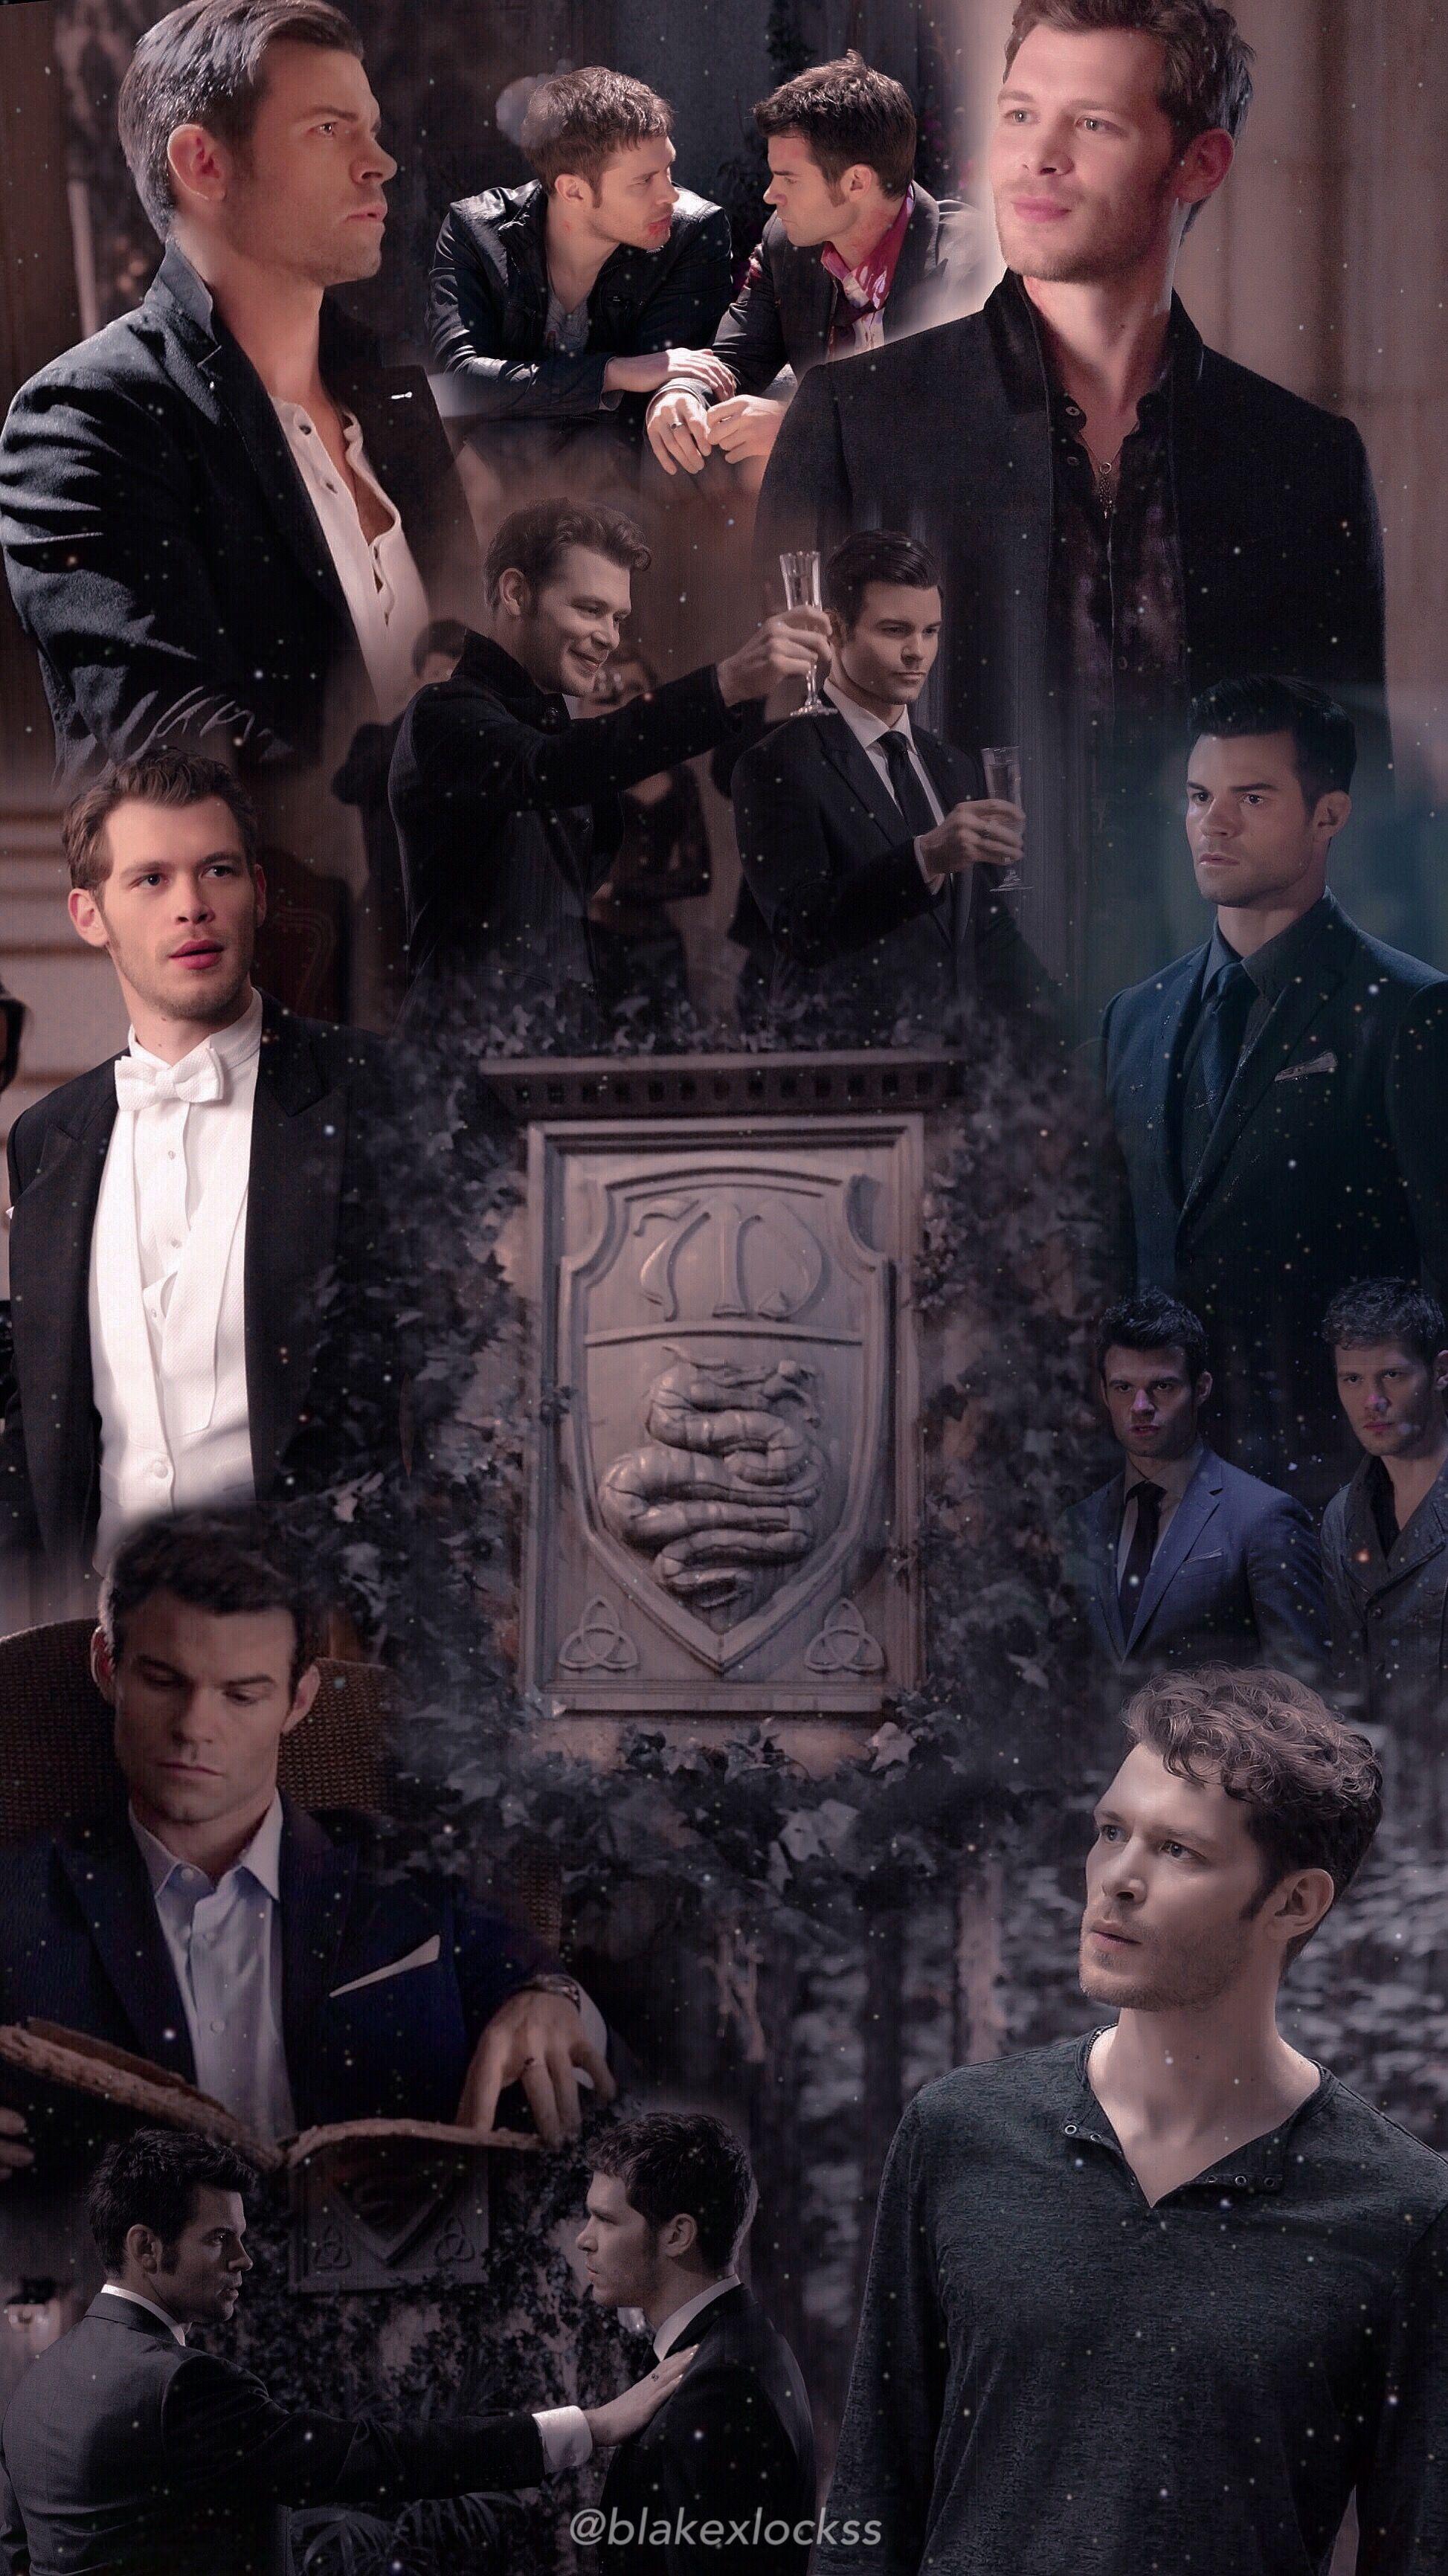 Pin De Erika Oliveira Em The Vampire Diaries The Originals